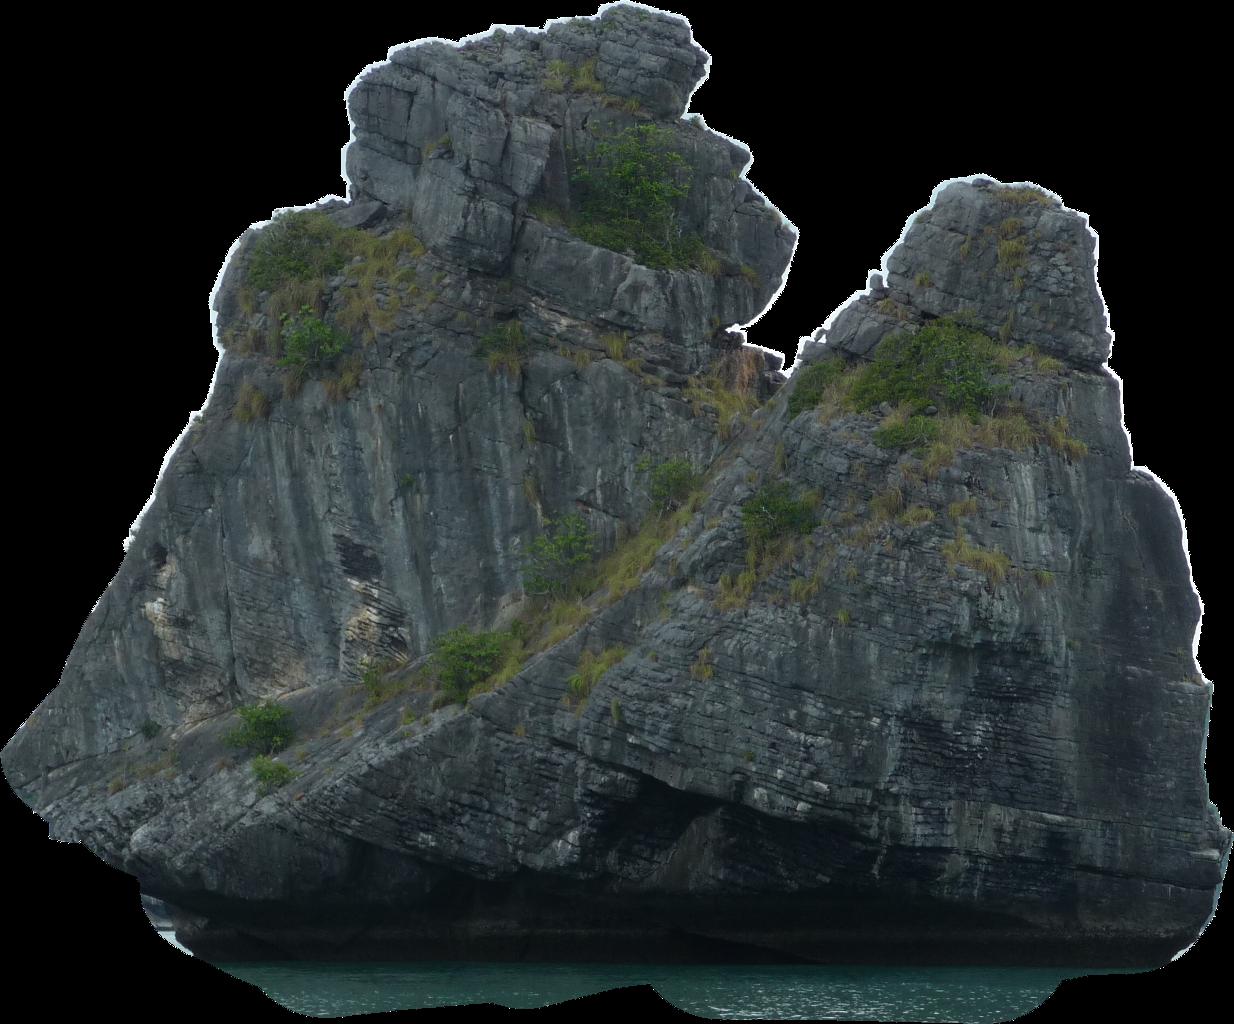 Clipart rock rock cliff. Ftestickers mountain hills freetoedit